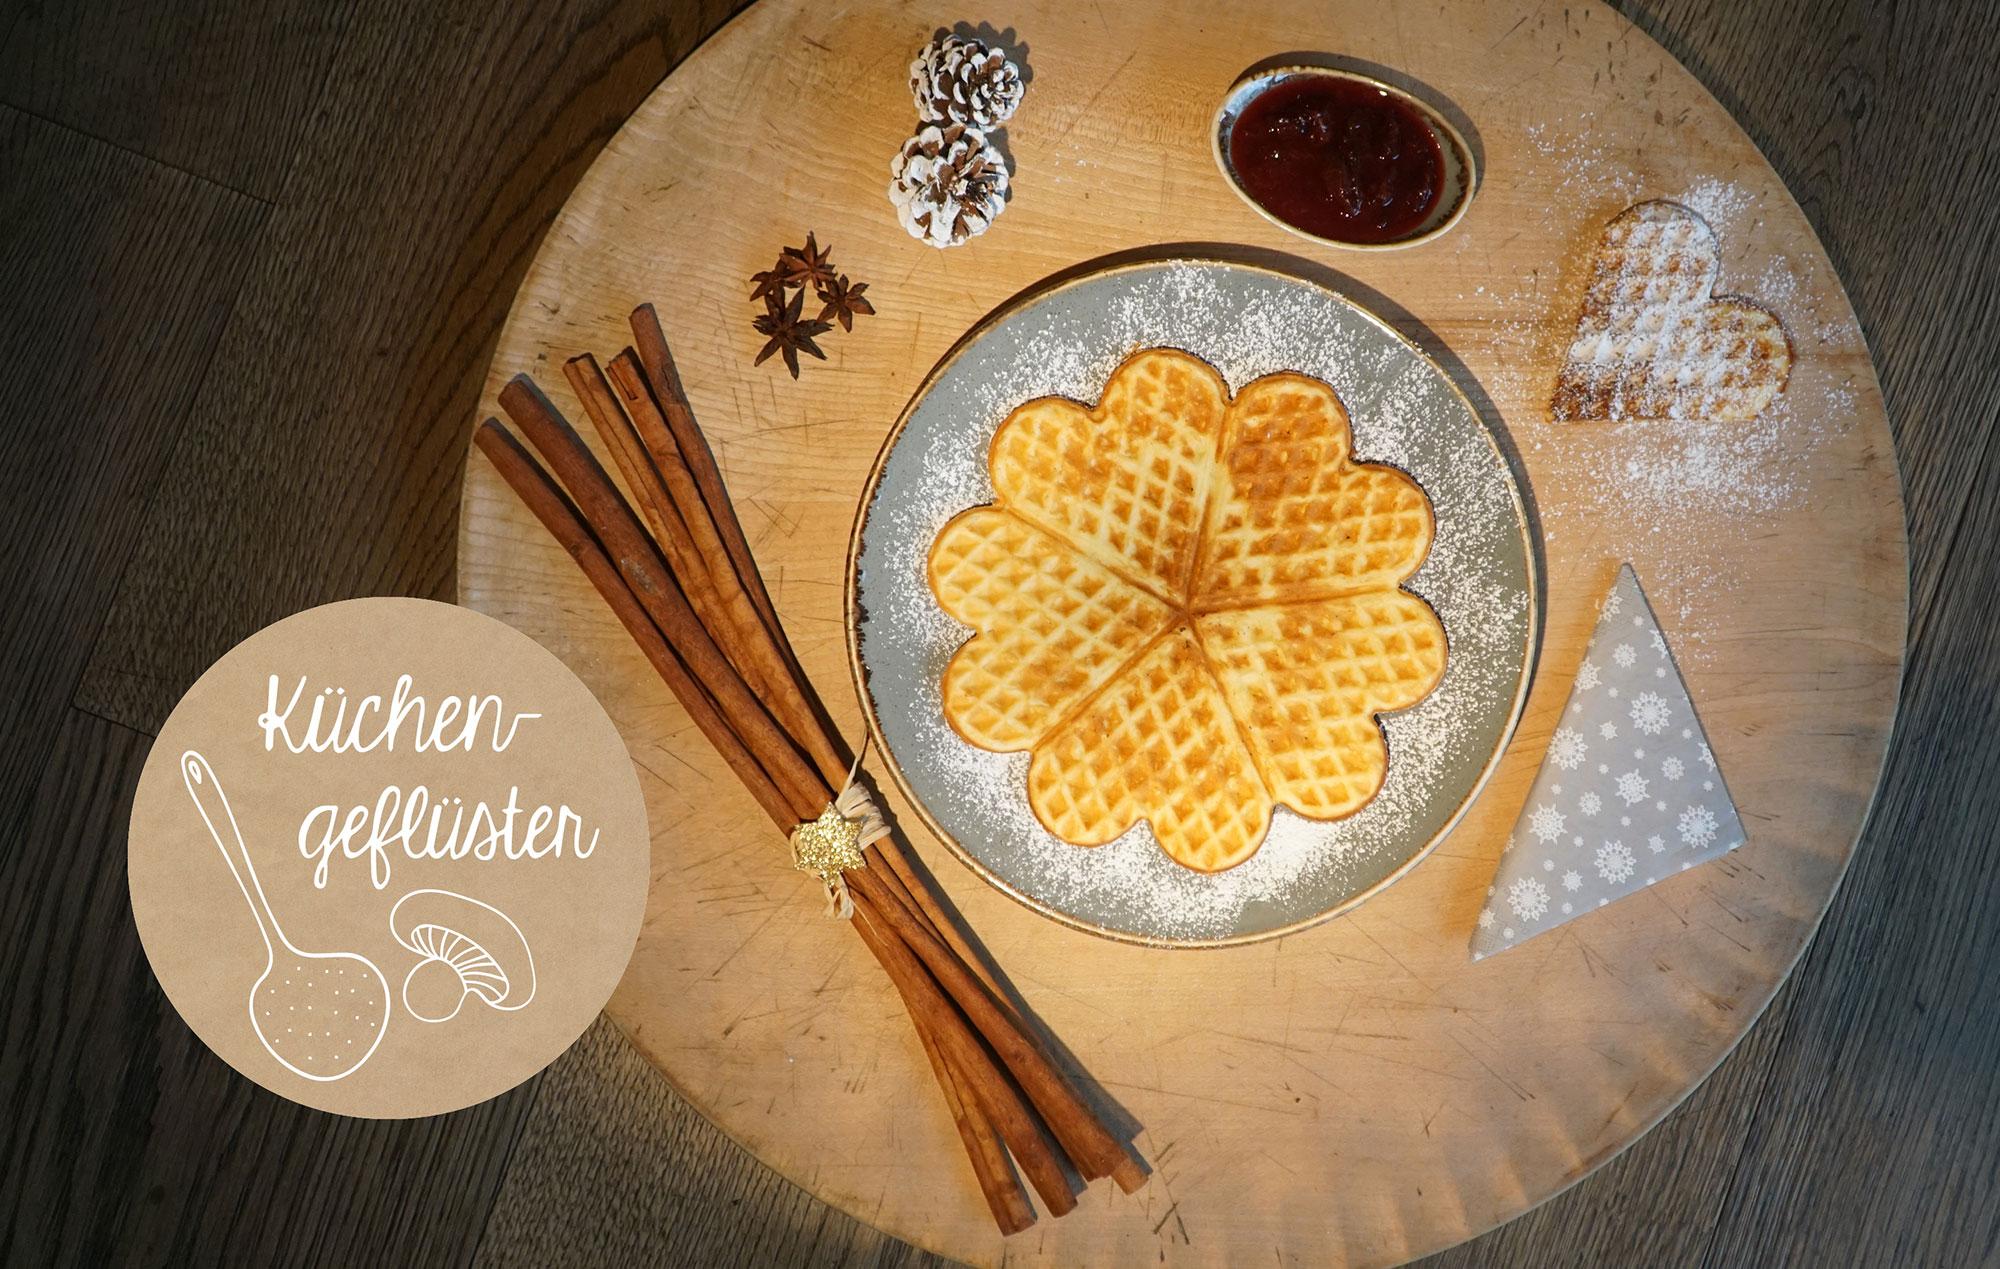 Opener buttermilk waffles